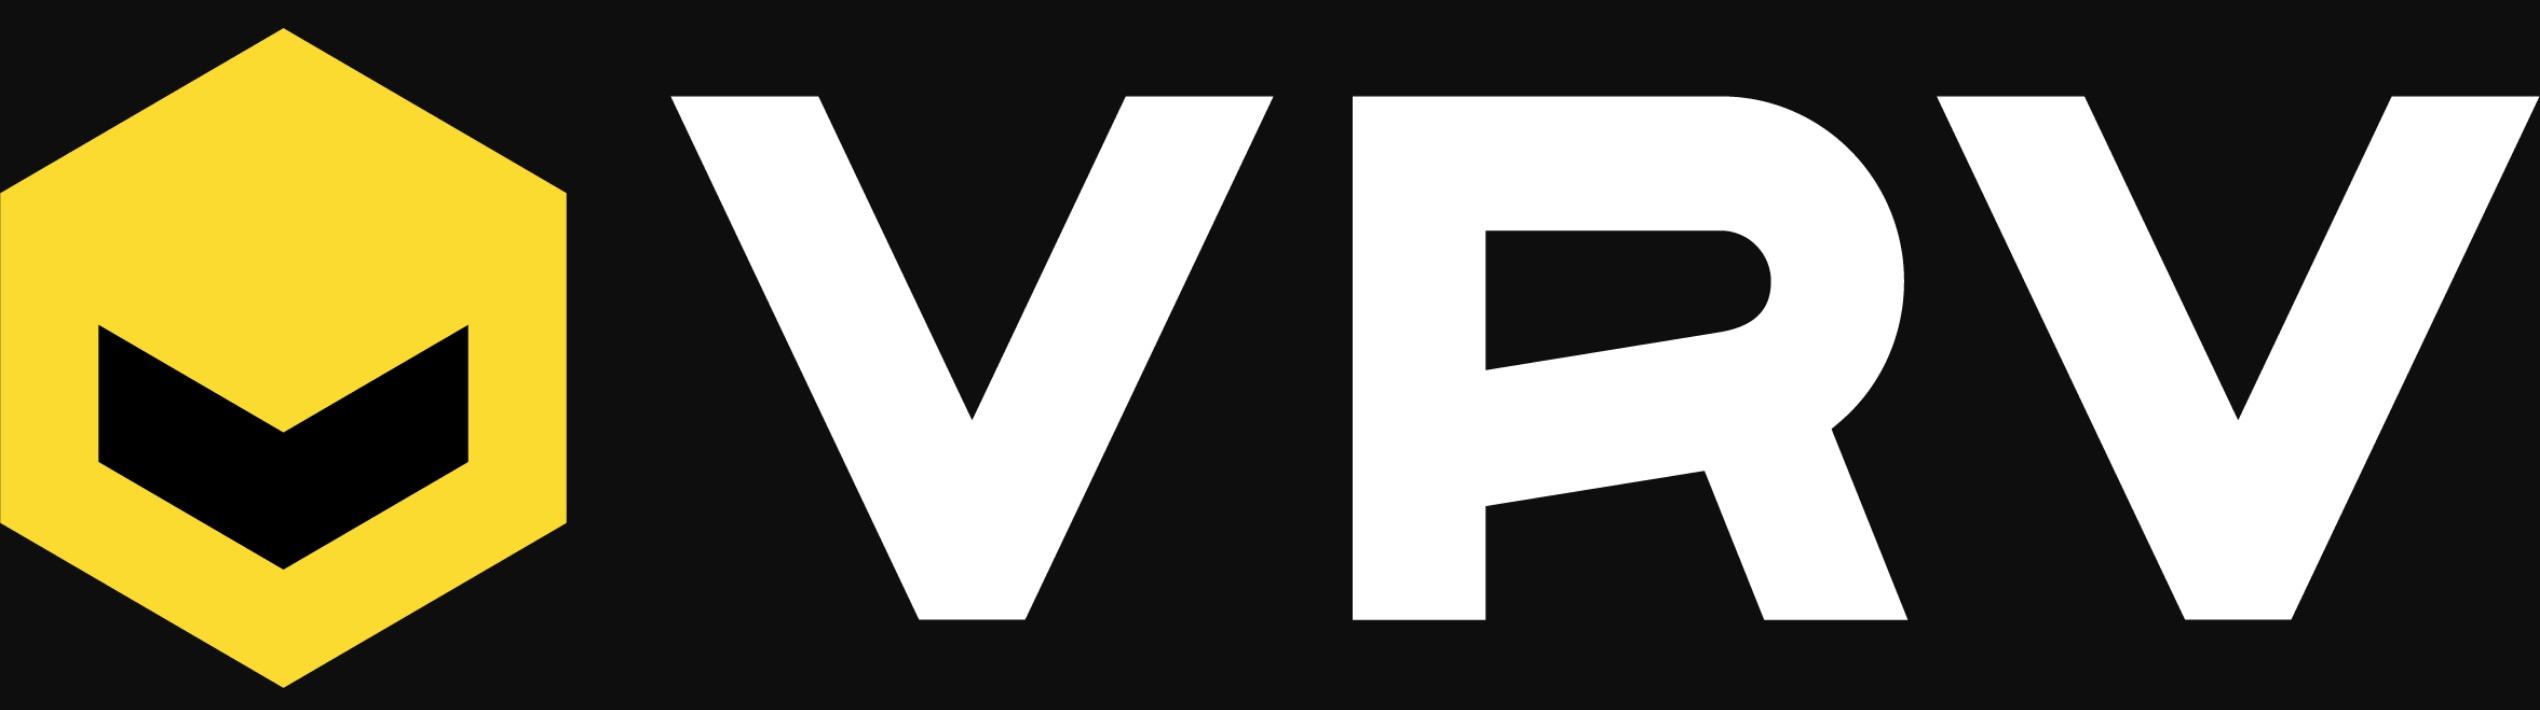 Streaming Services: VRV